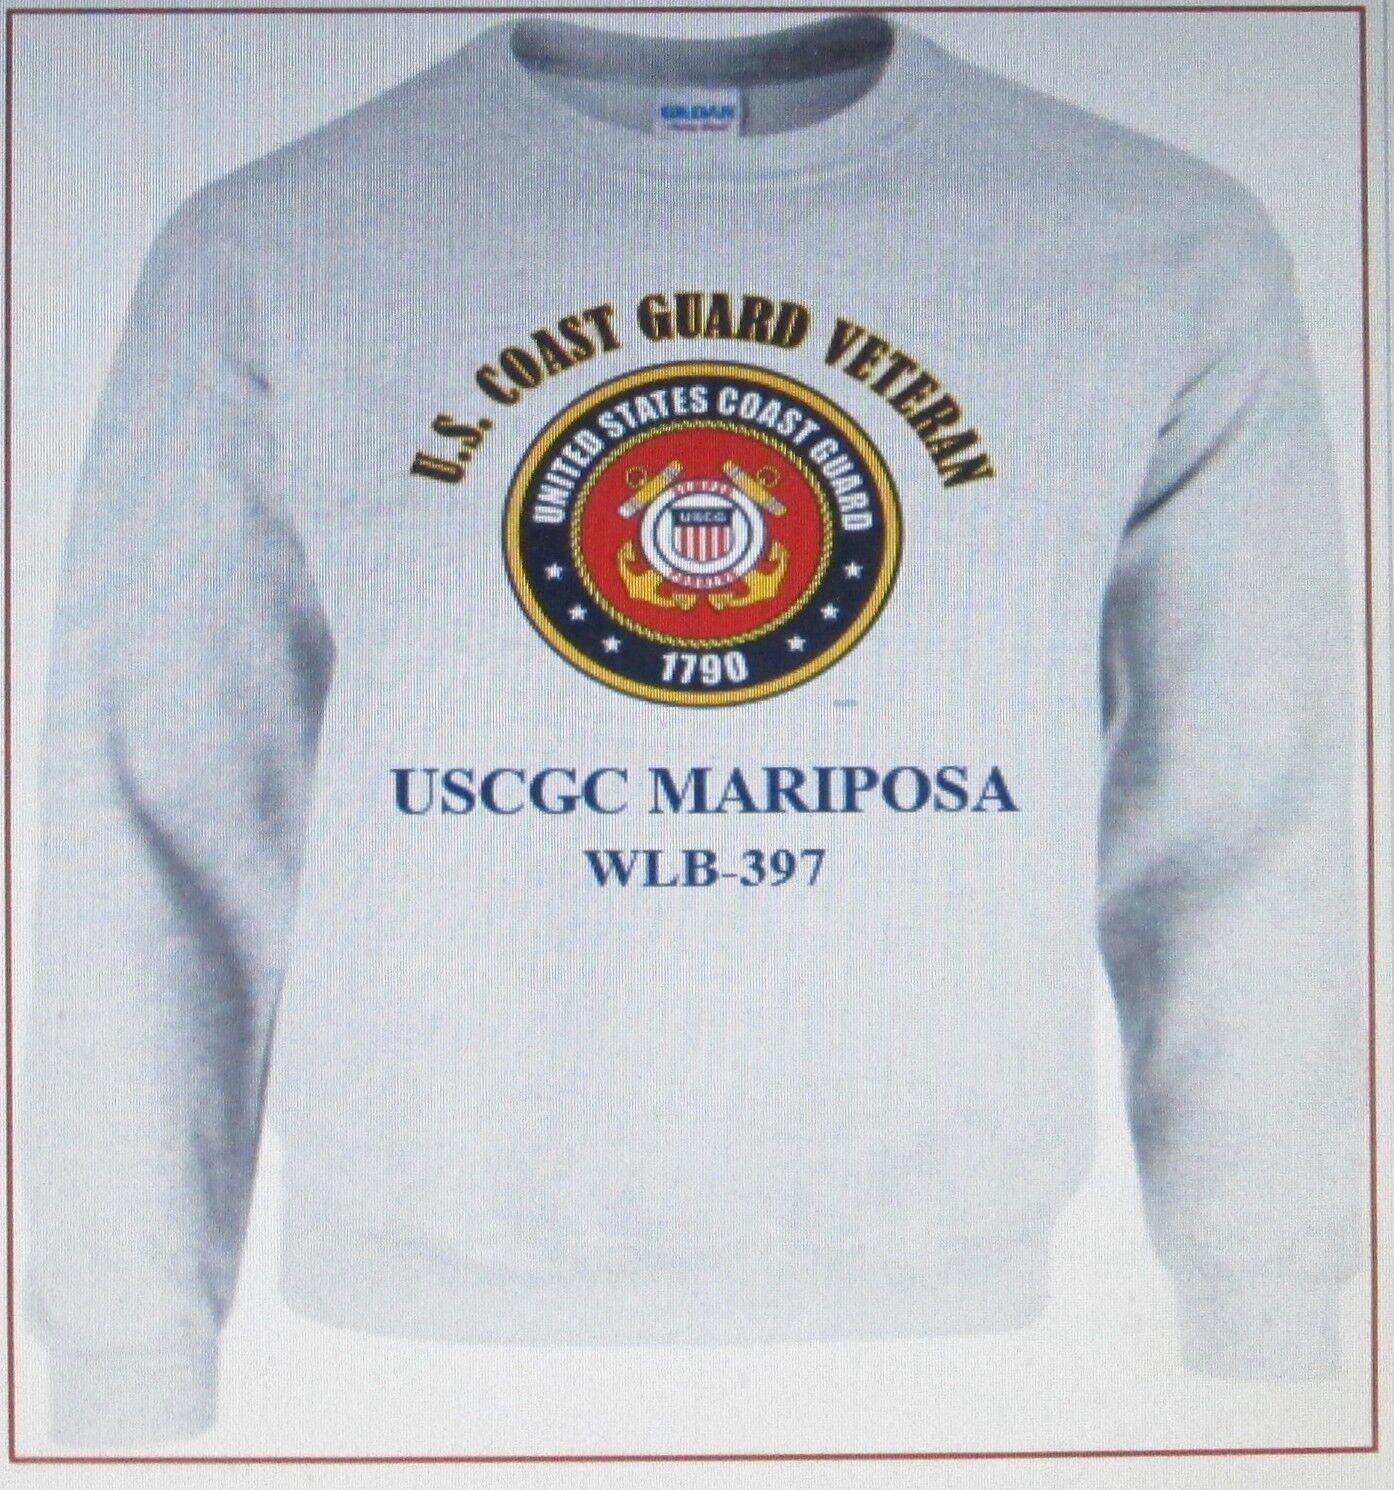 USCGC MARIPOSA  WLB-397  COAST GUARD VETERAN SWEATSHIRT